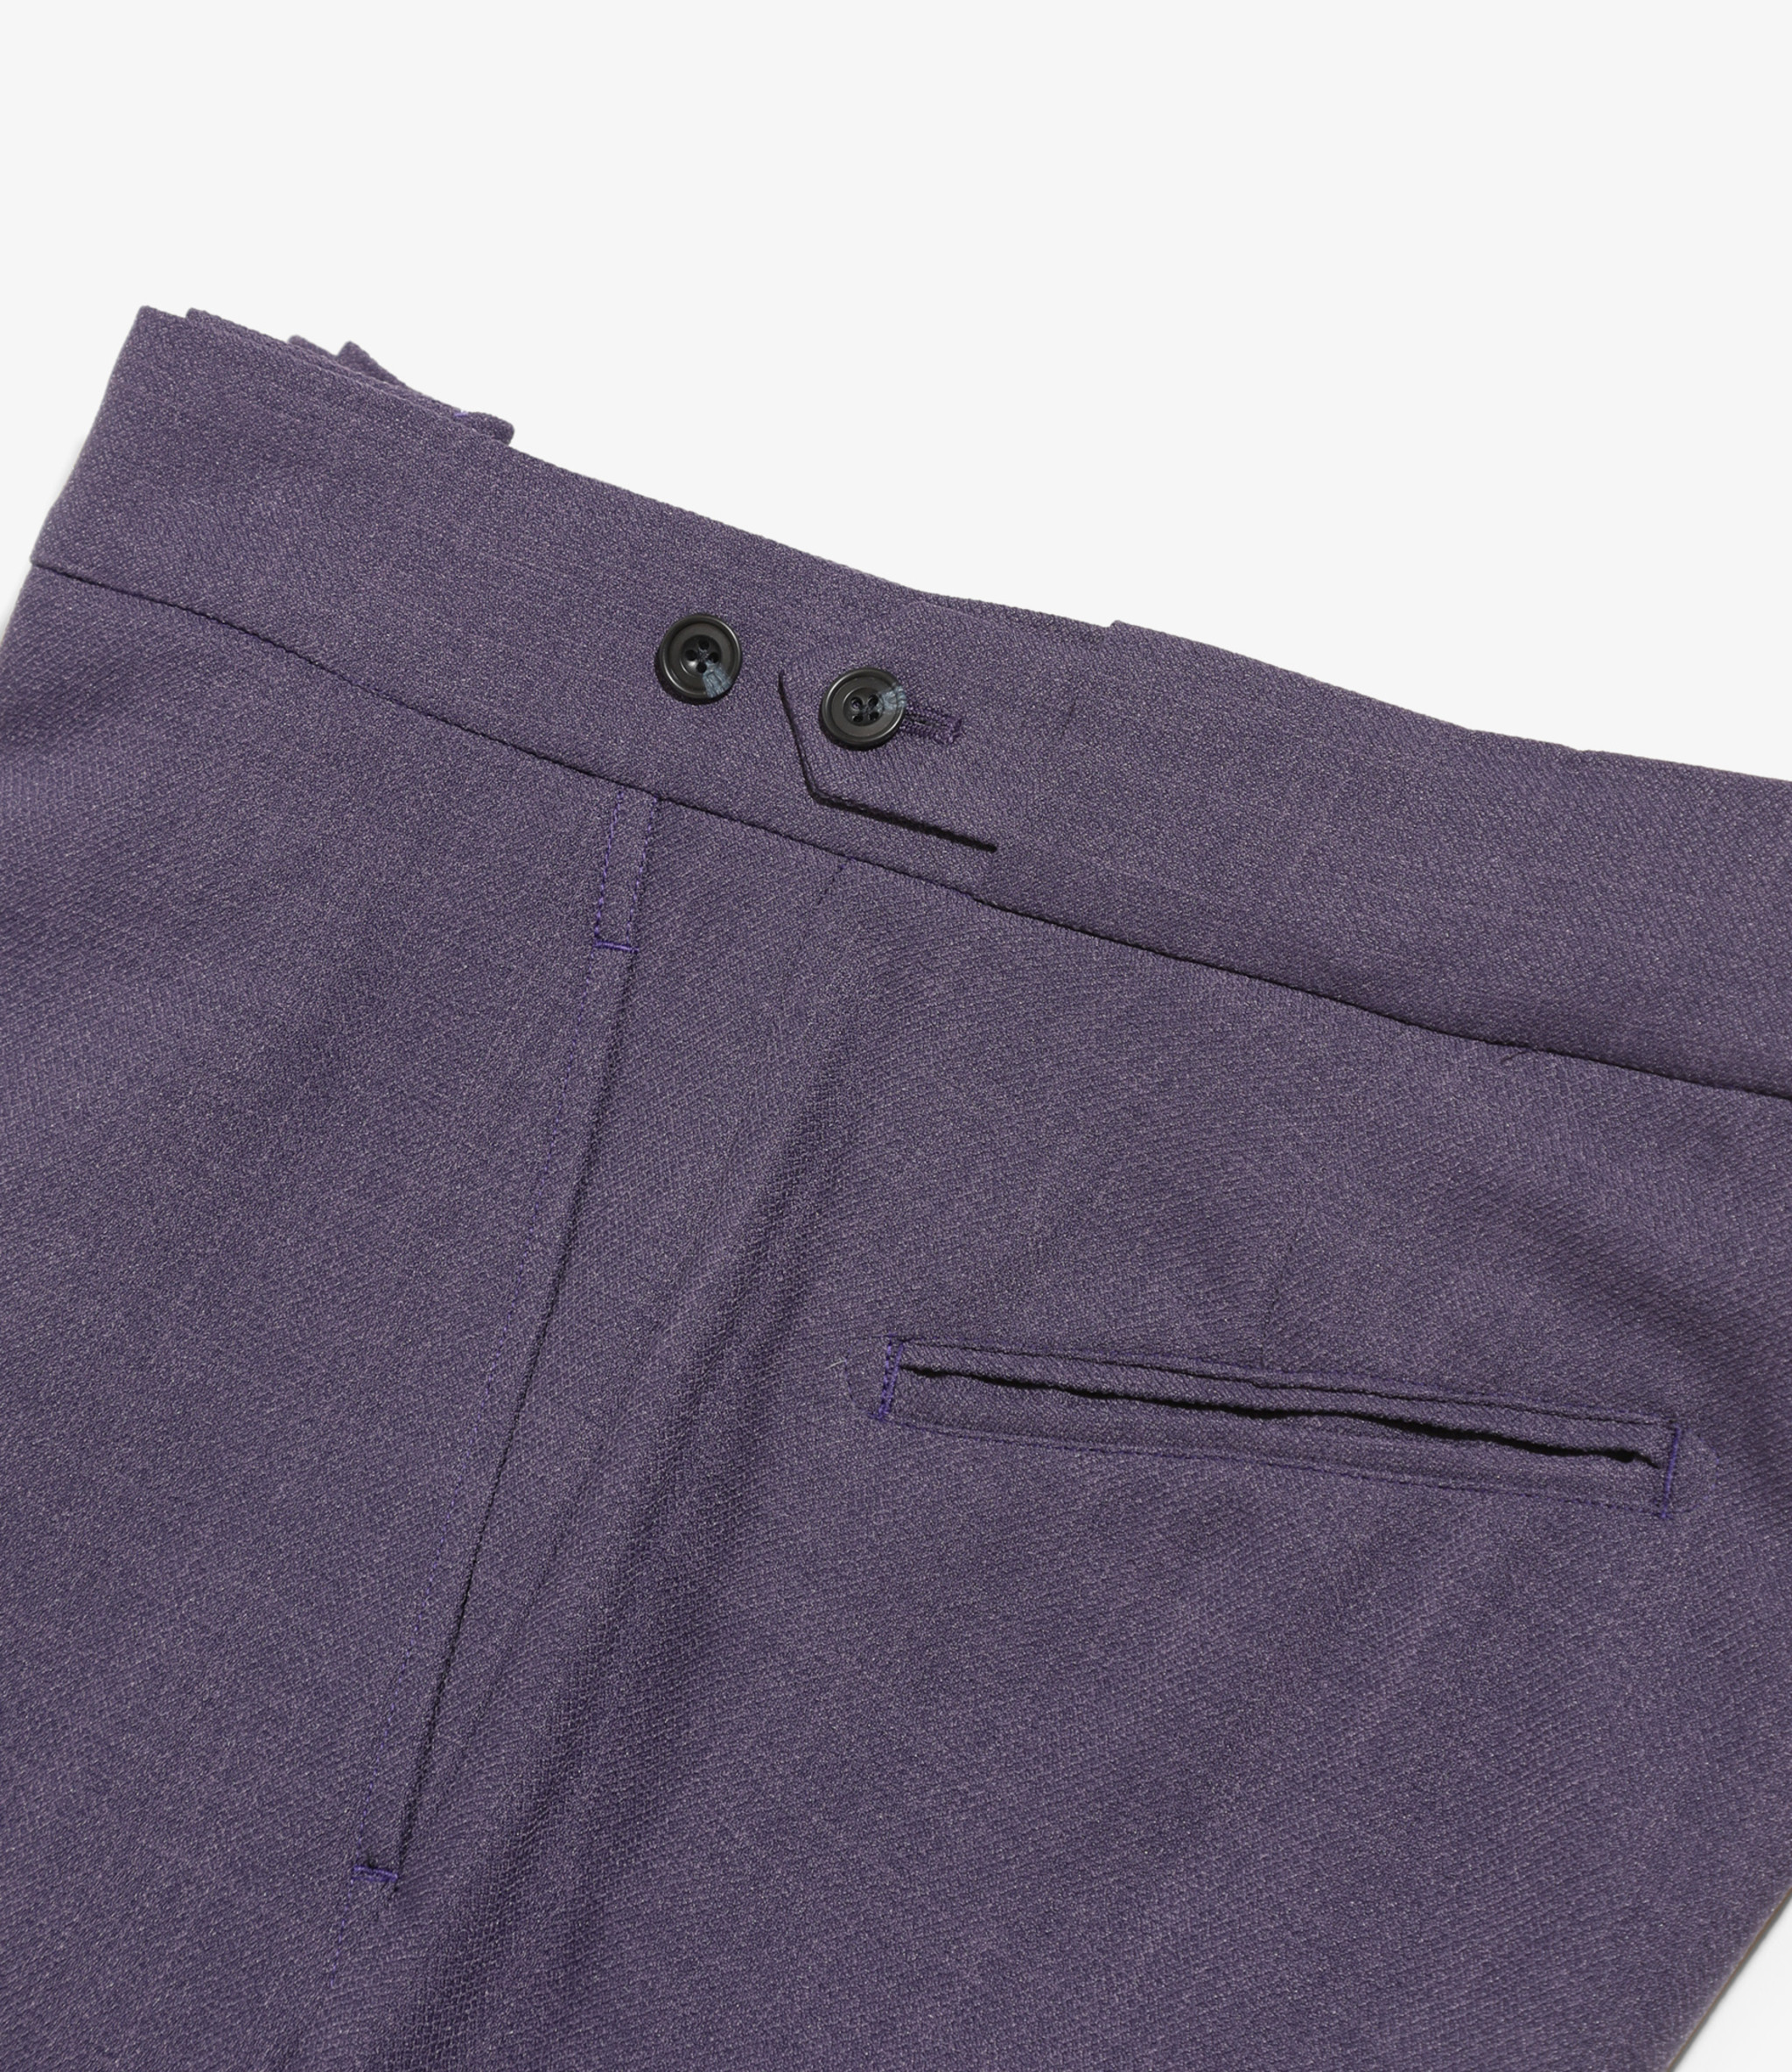 Needles Side Tab Trouser - Poly Dobby Twill - Purple